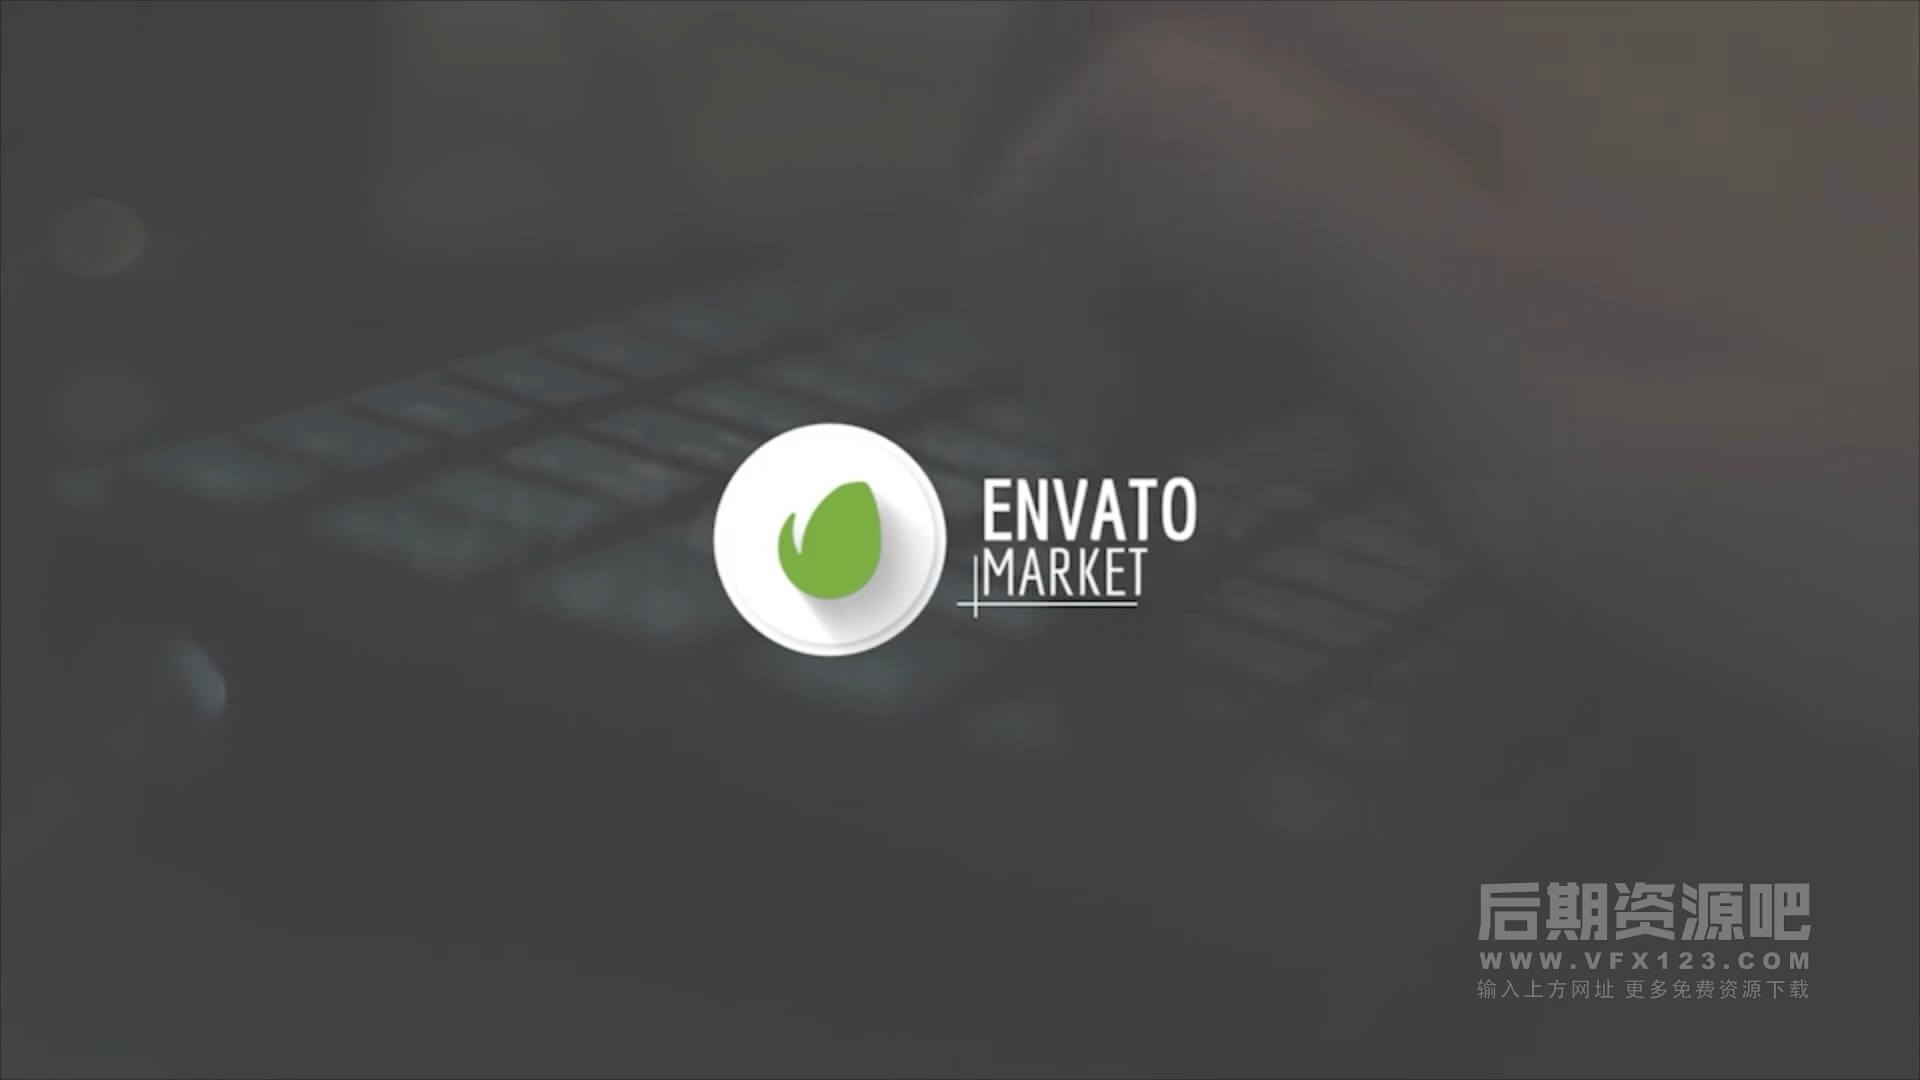 Motion模板 简约干净徽标LOGO展示片头片尾模板 clean fast logo reveal